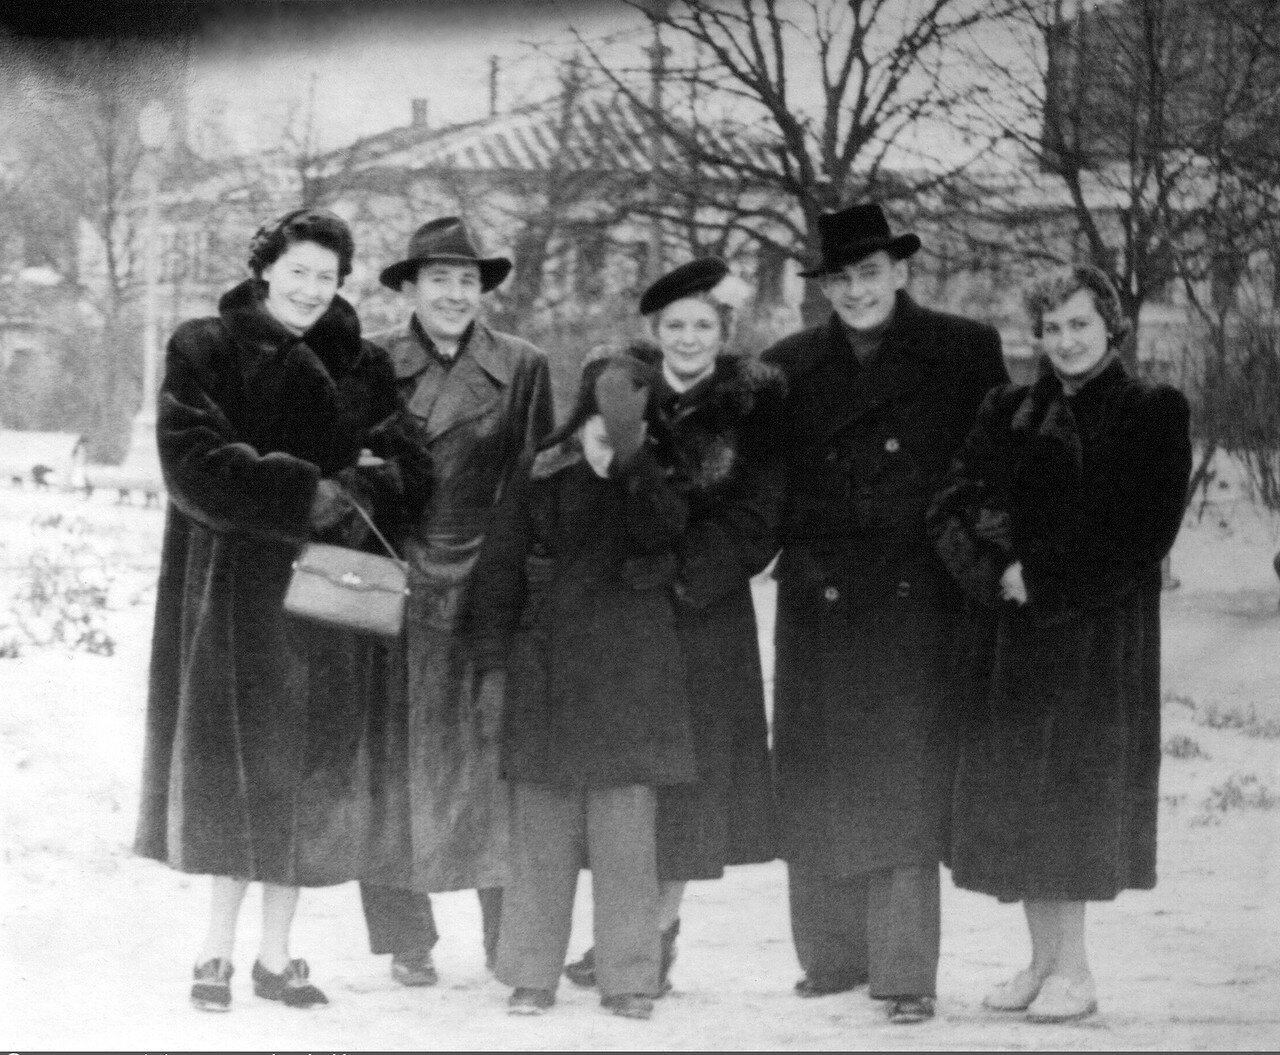 1953. Москва. Сквер. Площадь Журавлёва